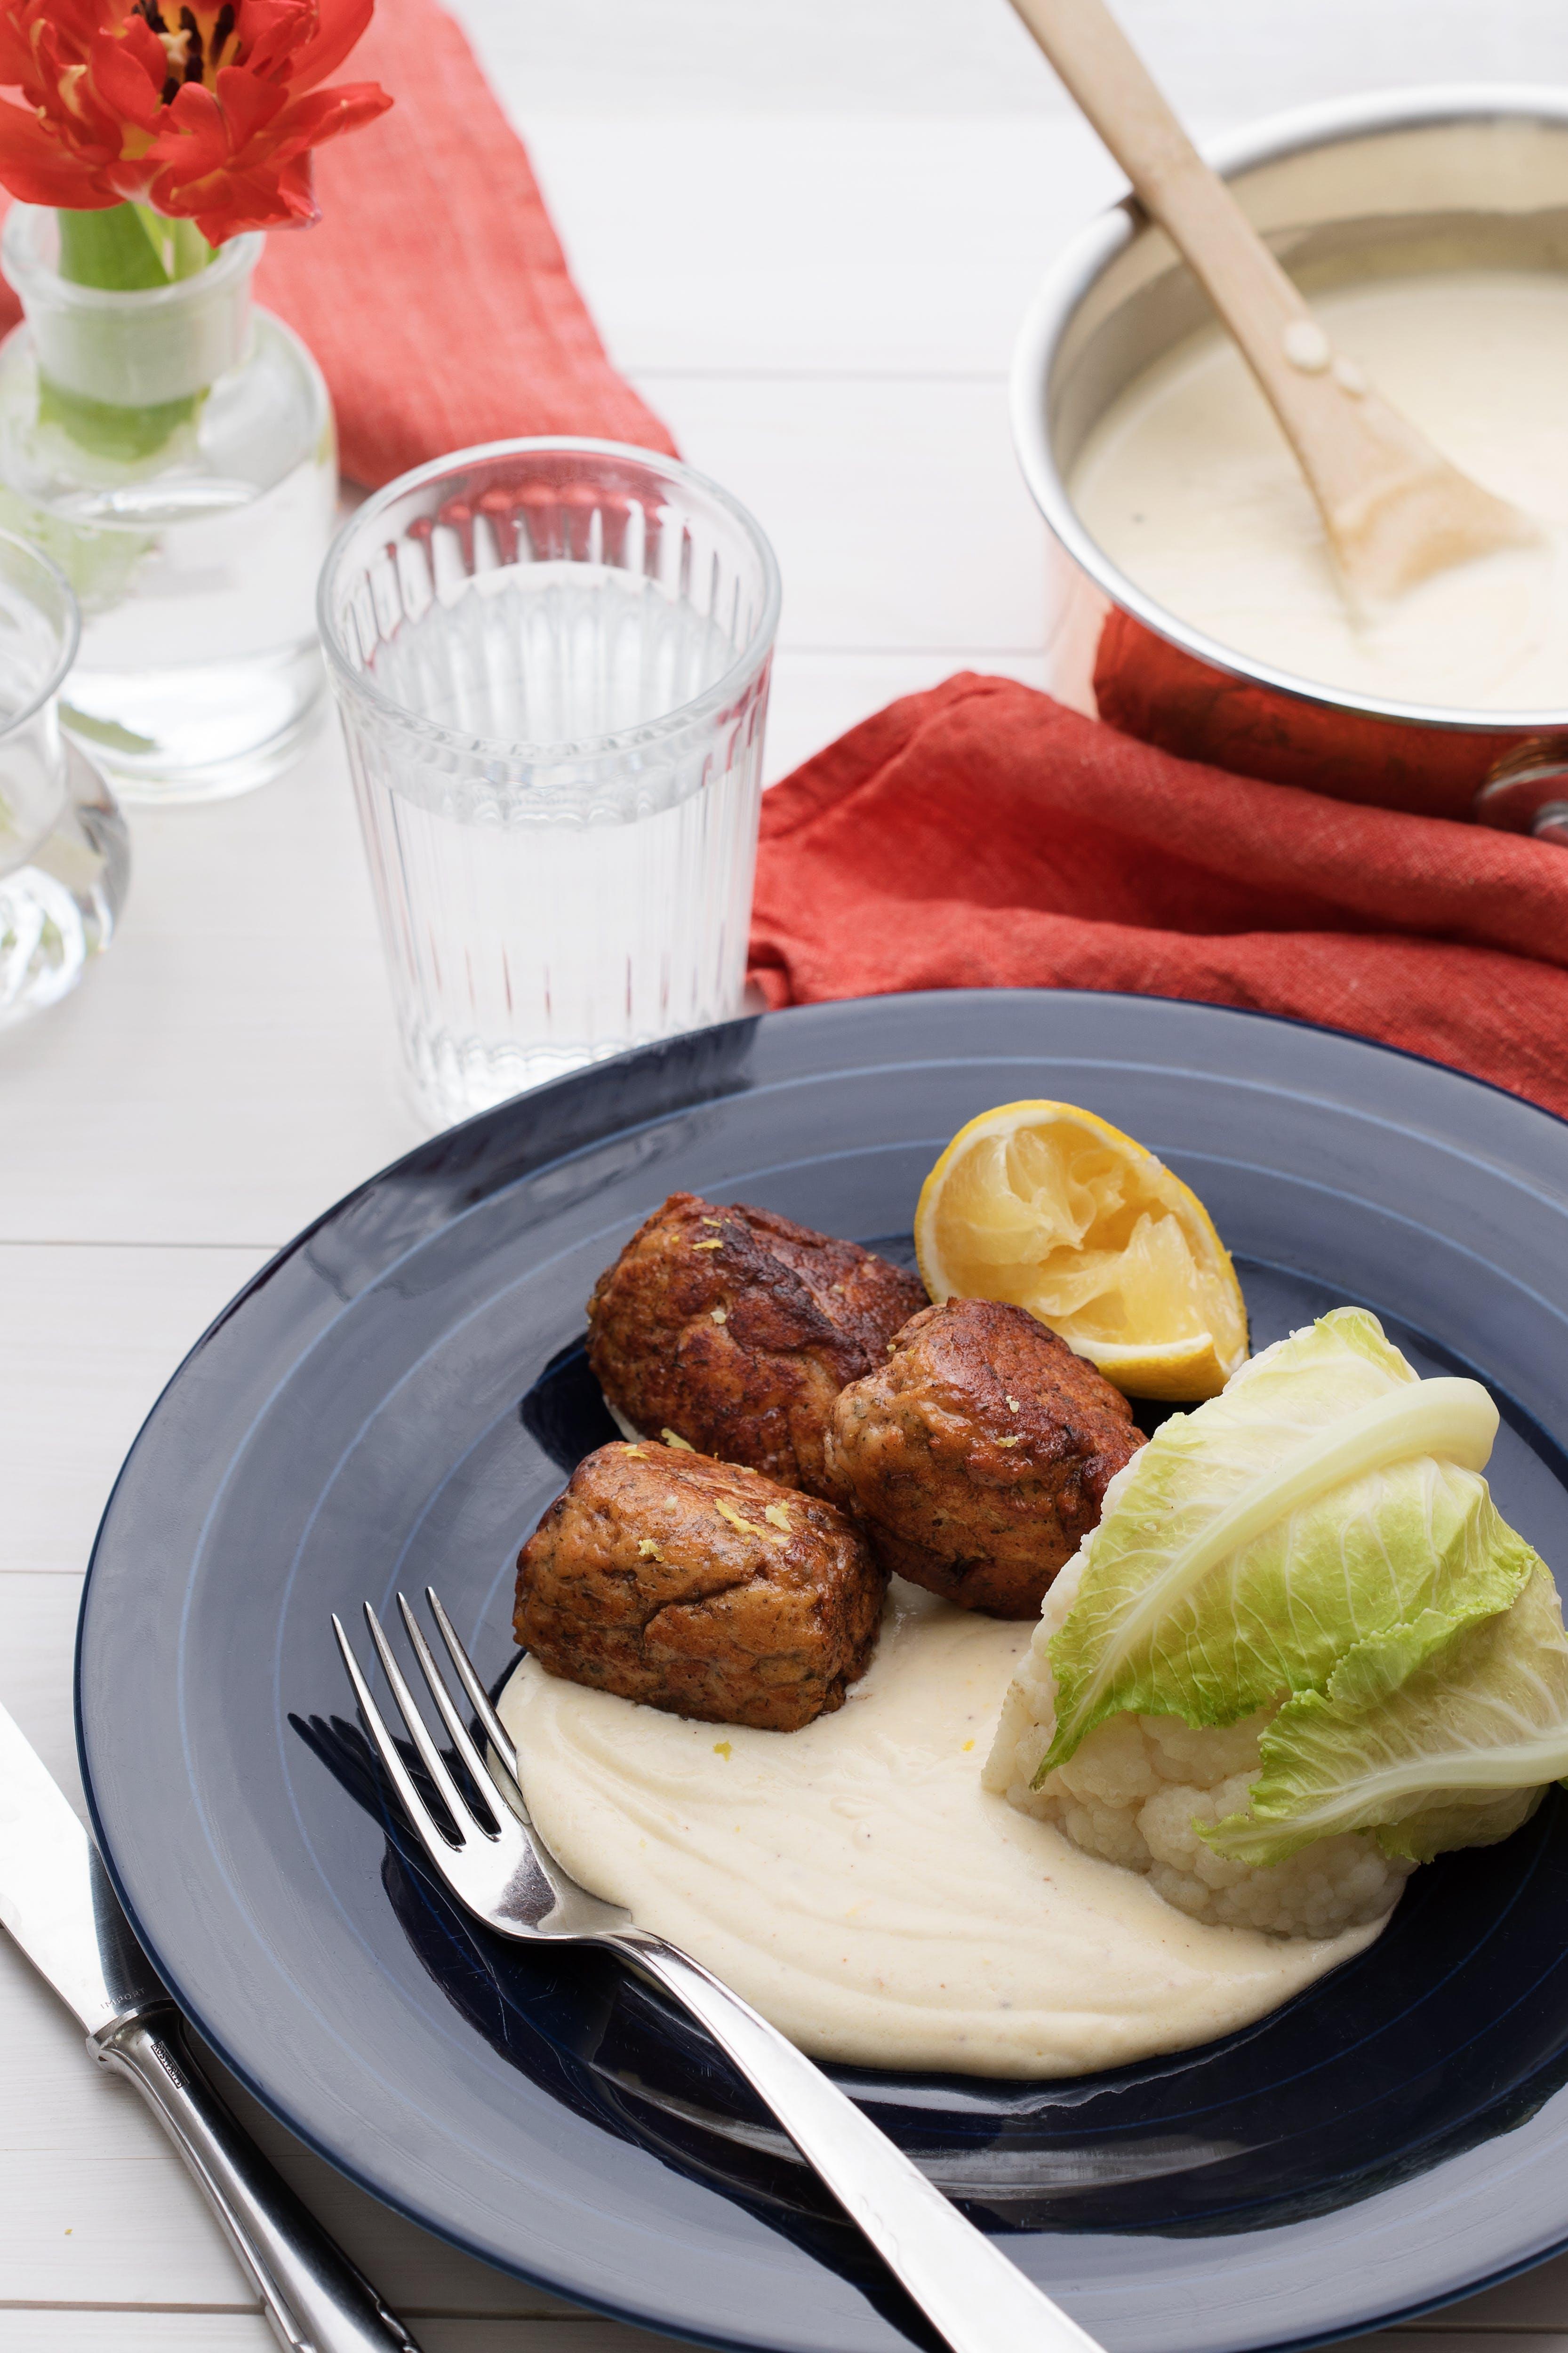 Salmon meatballs with lemon béchamel sauce